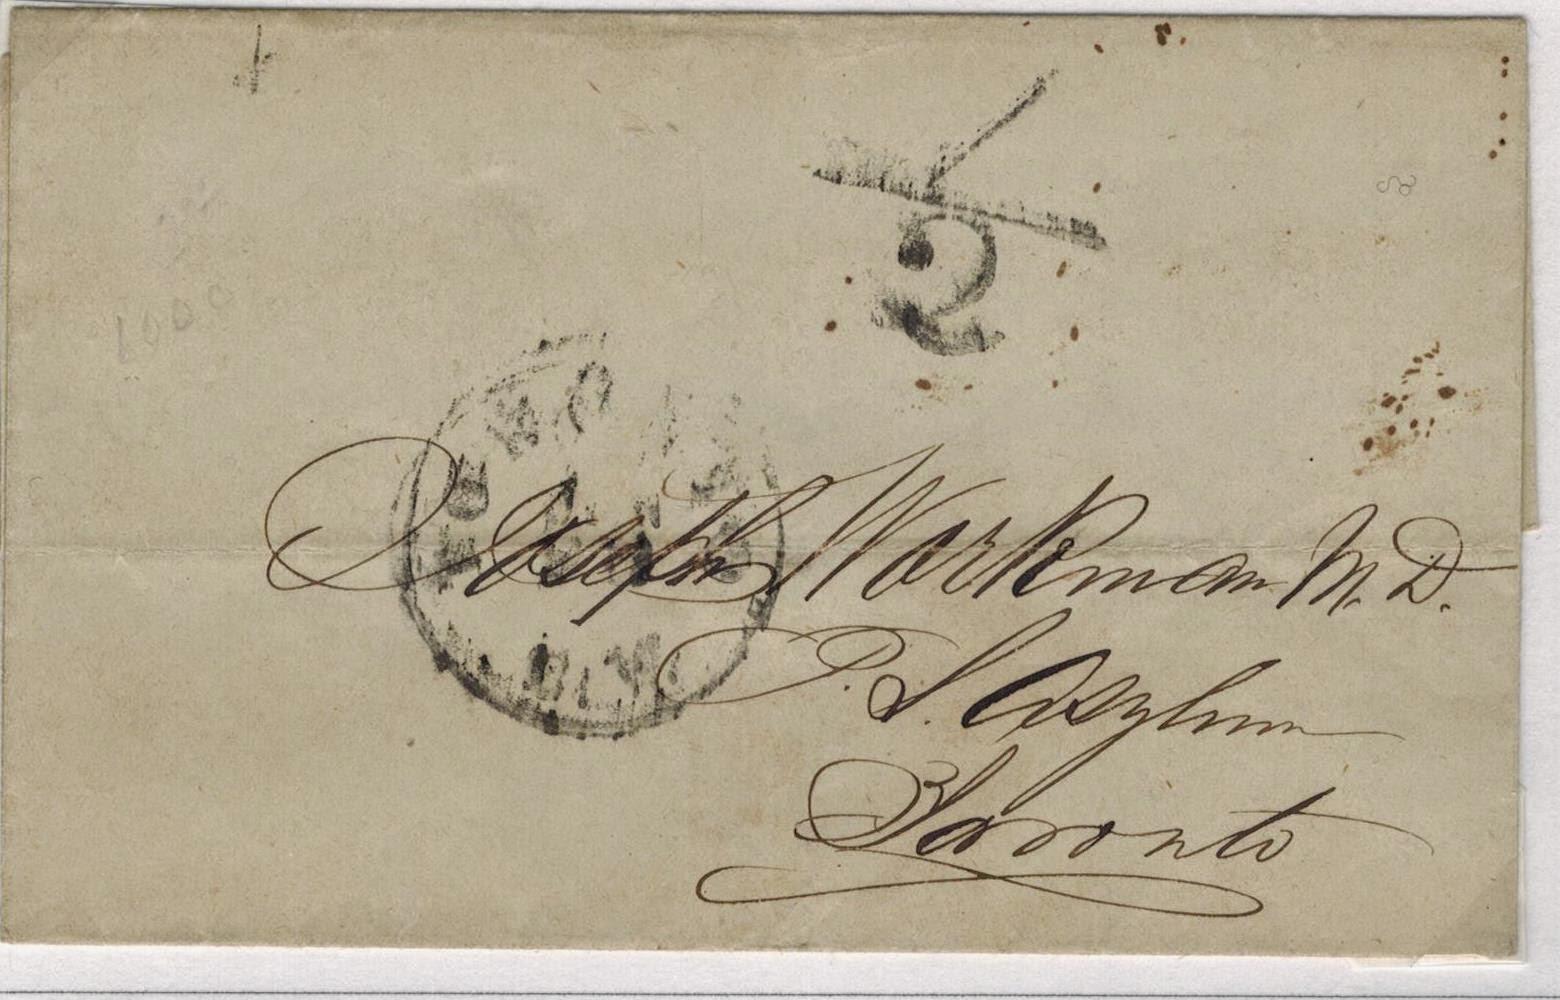 Postal History Corner: 2  Canada Domestic Local Letter Rates